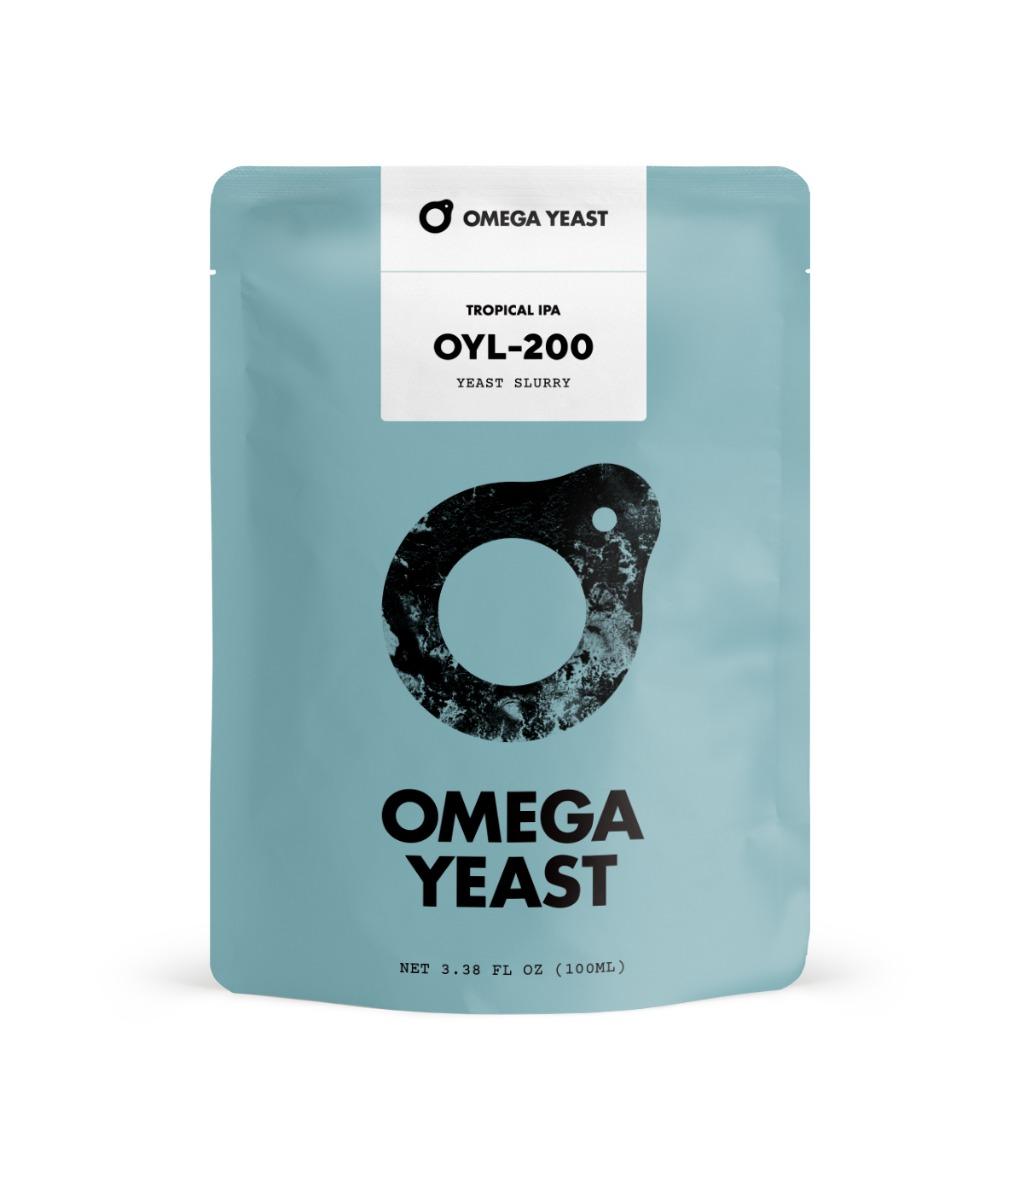 Omega Yeast OYL-200 Tropical IPA